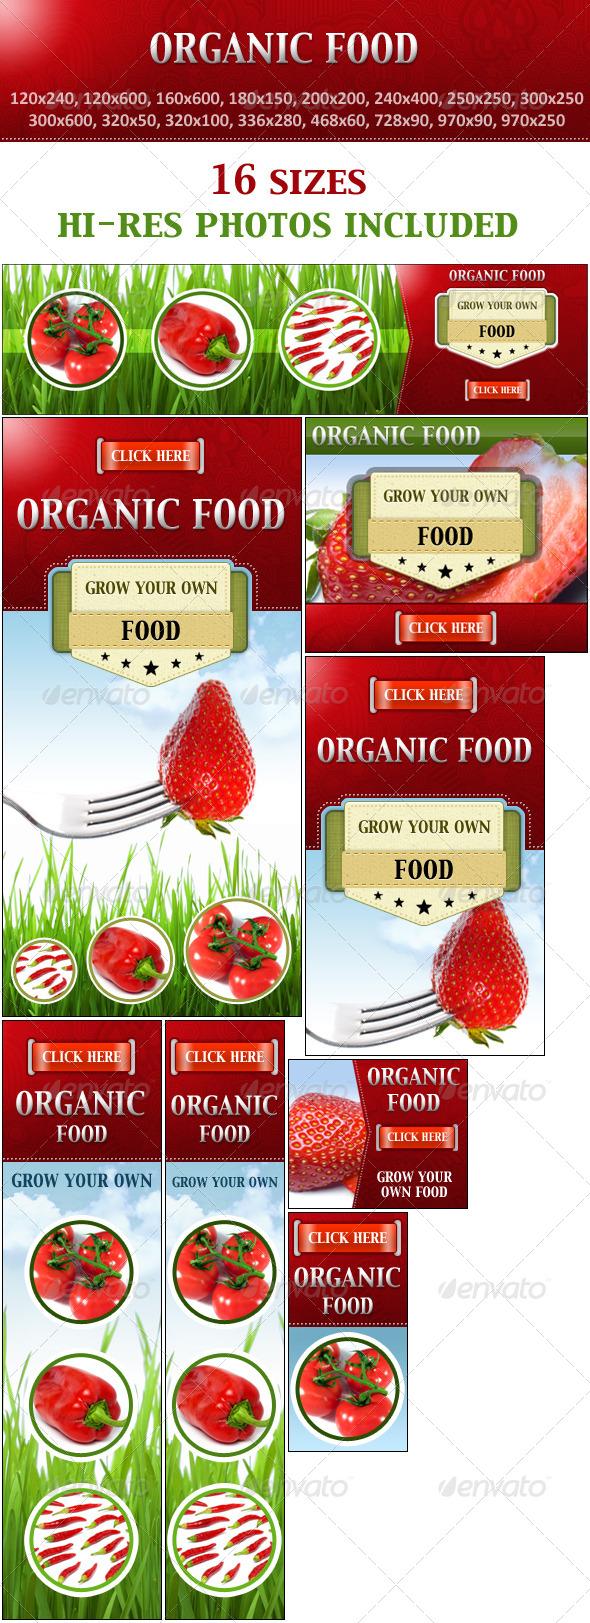 Organic Food Grow Your Own Food